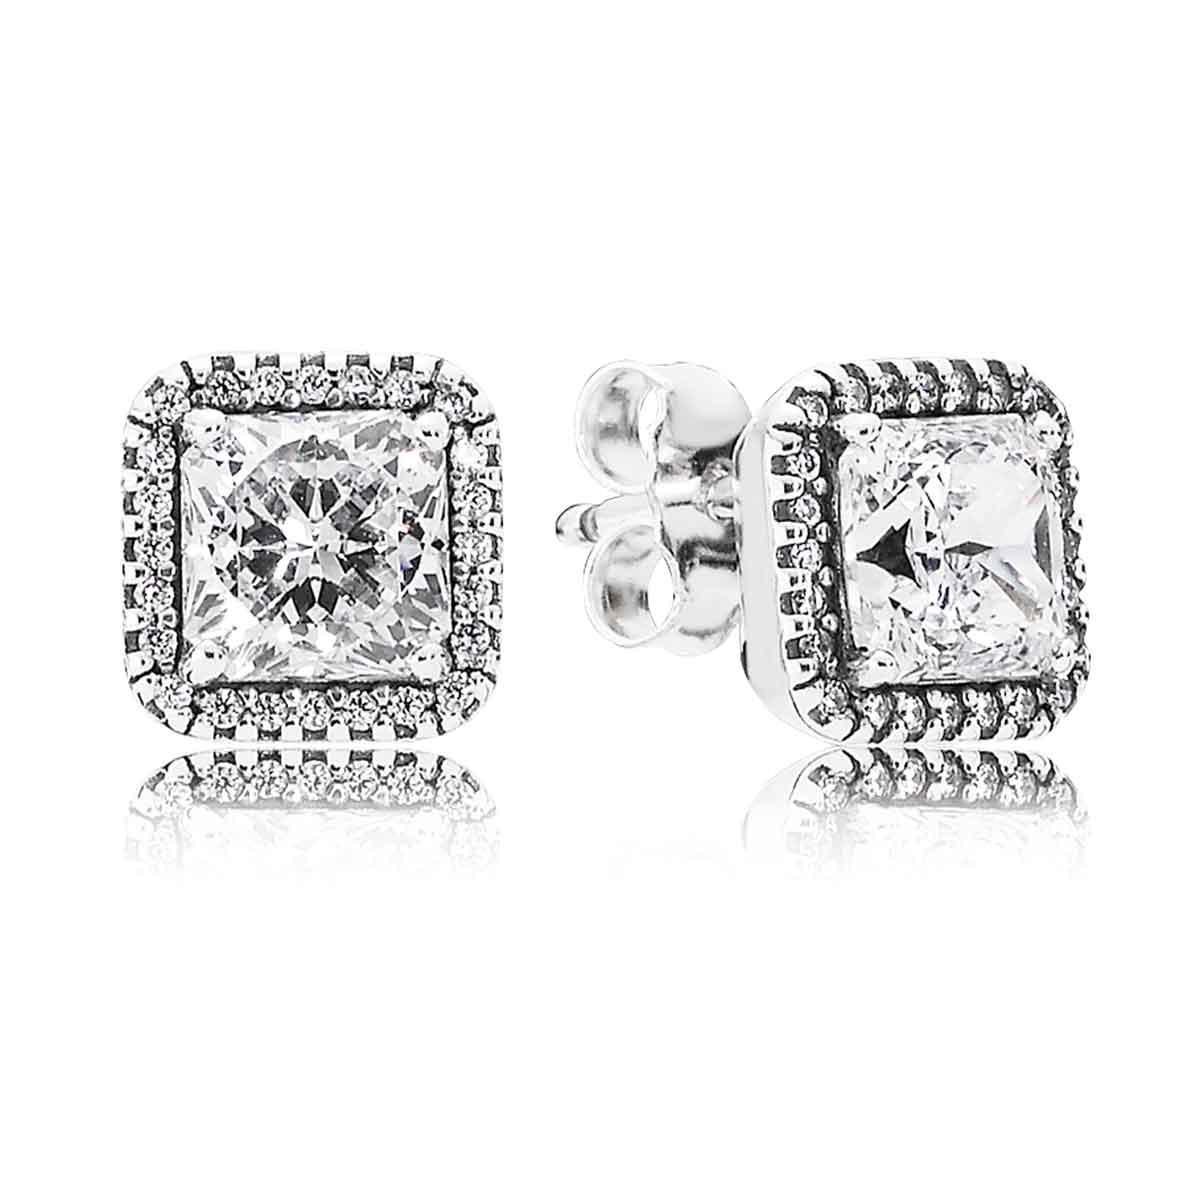 PANDORA Timeless Elegance Earrings: Precious Accents, Ltd.